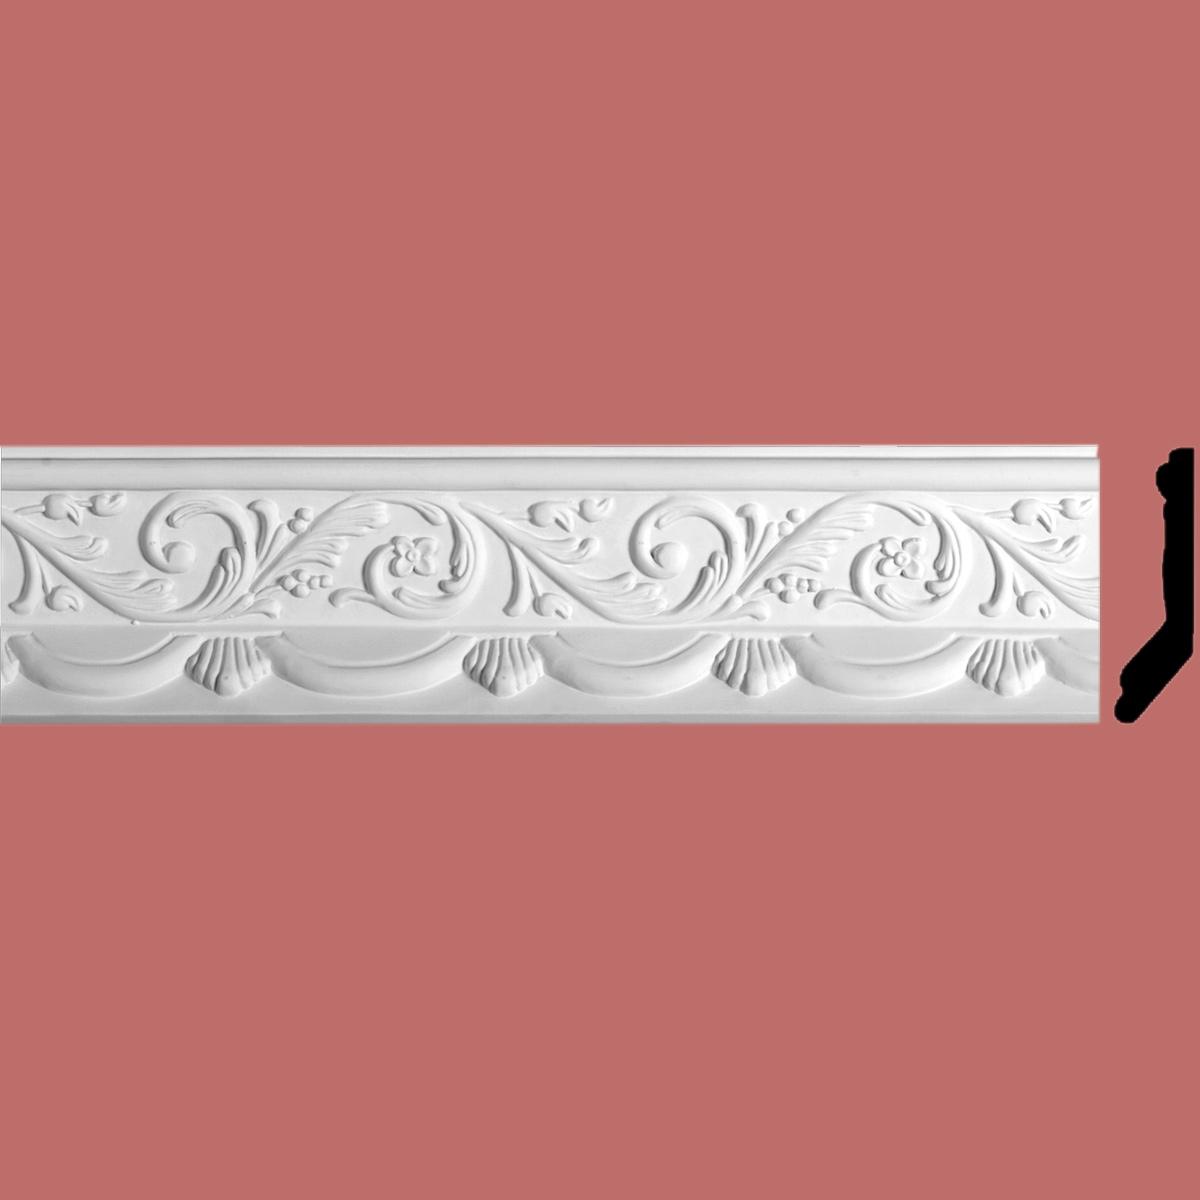 Cornice White Urethane Sample of 20794 Cornice Cornice Moulding Cornice Molding